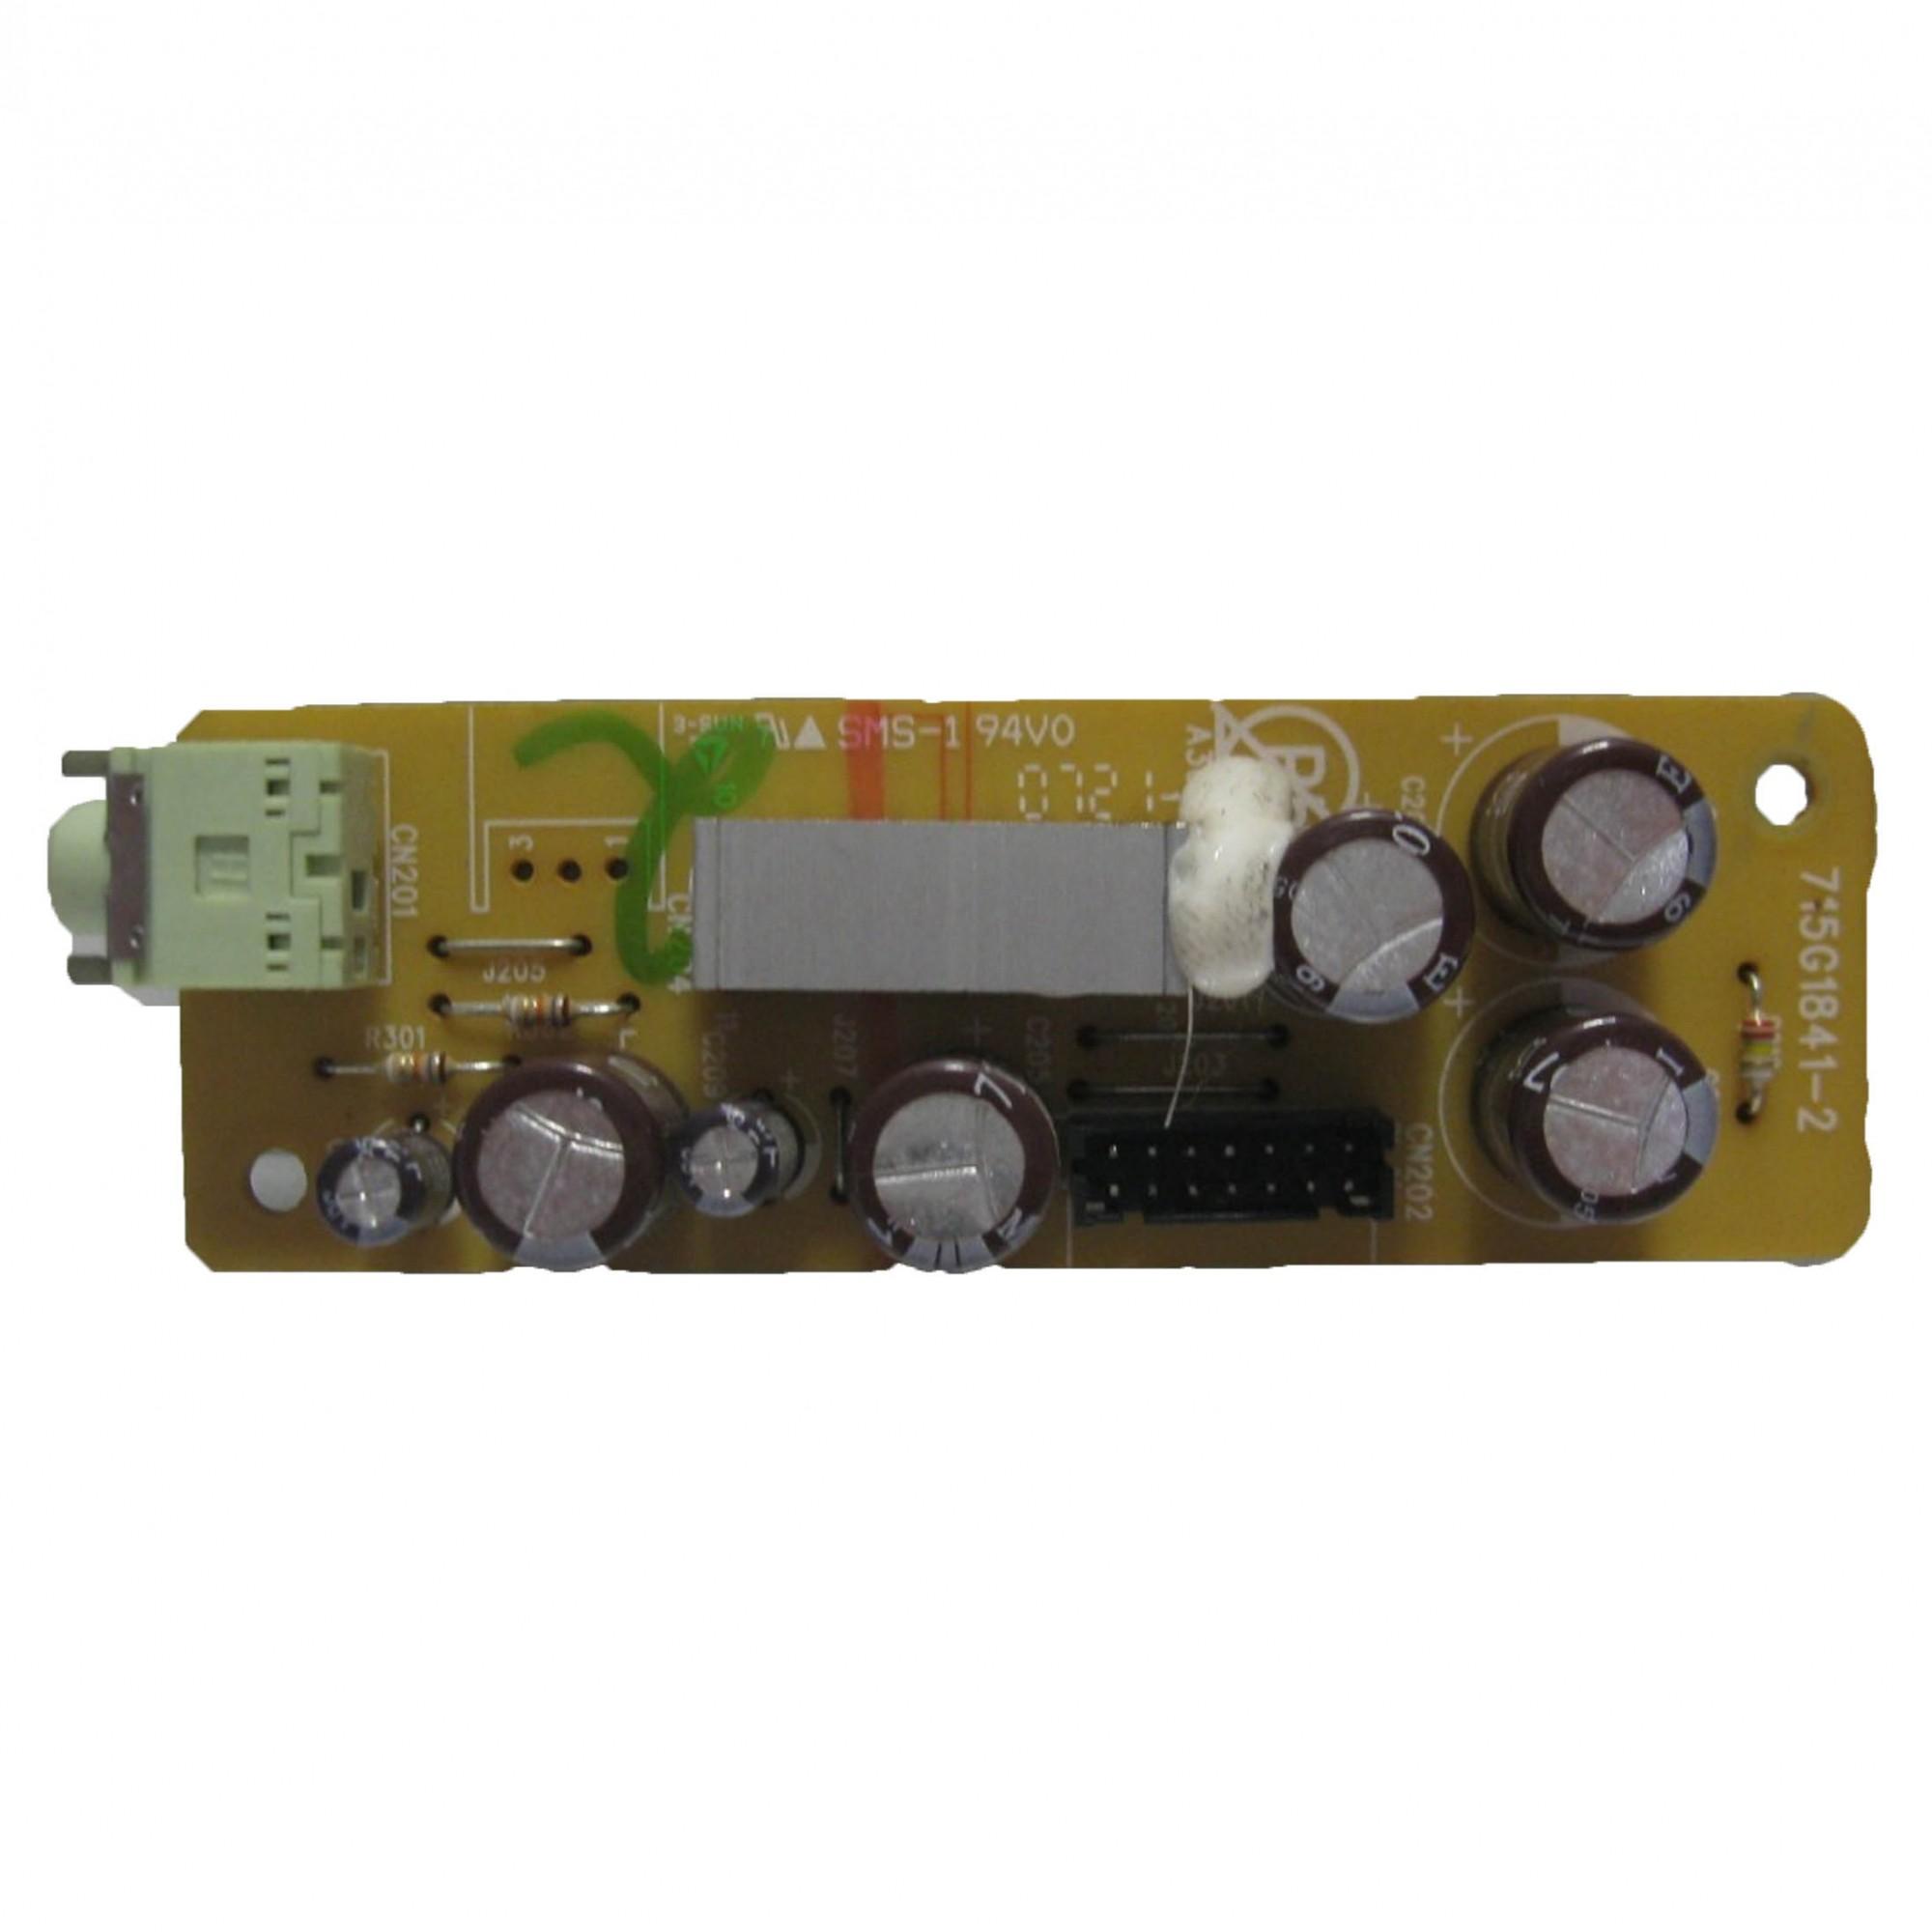 Placa de Áudio Monitor Aoc / LG Login 712sa-l PN:715g1841-2 - Retirado